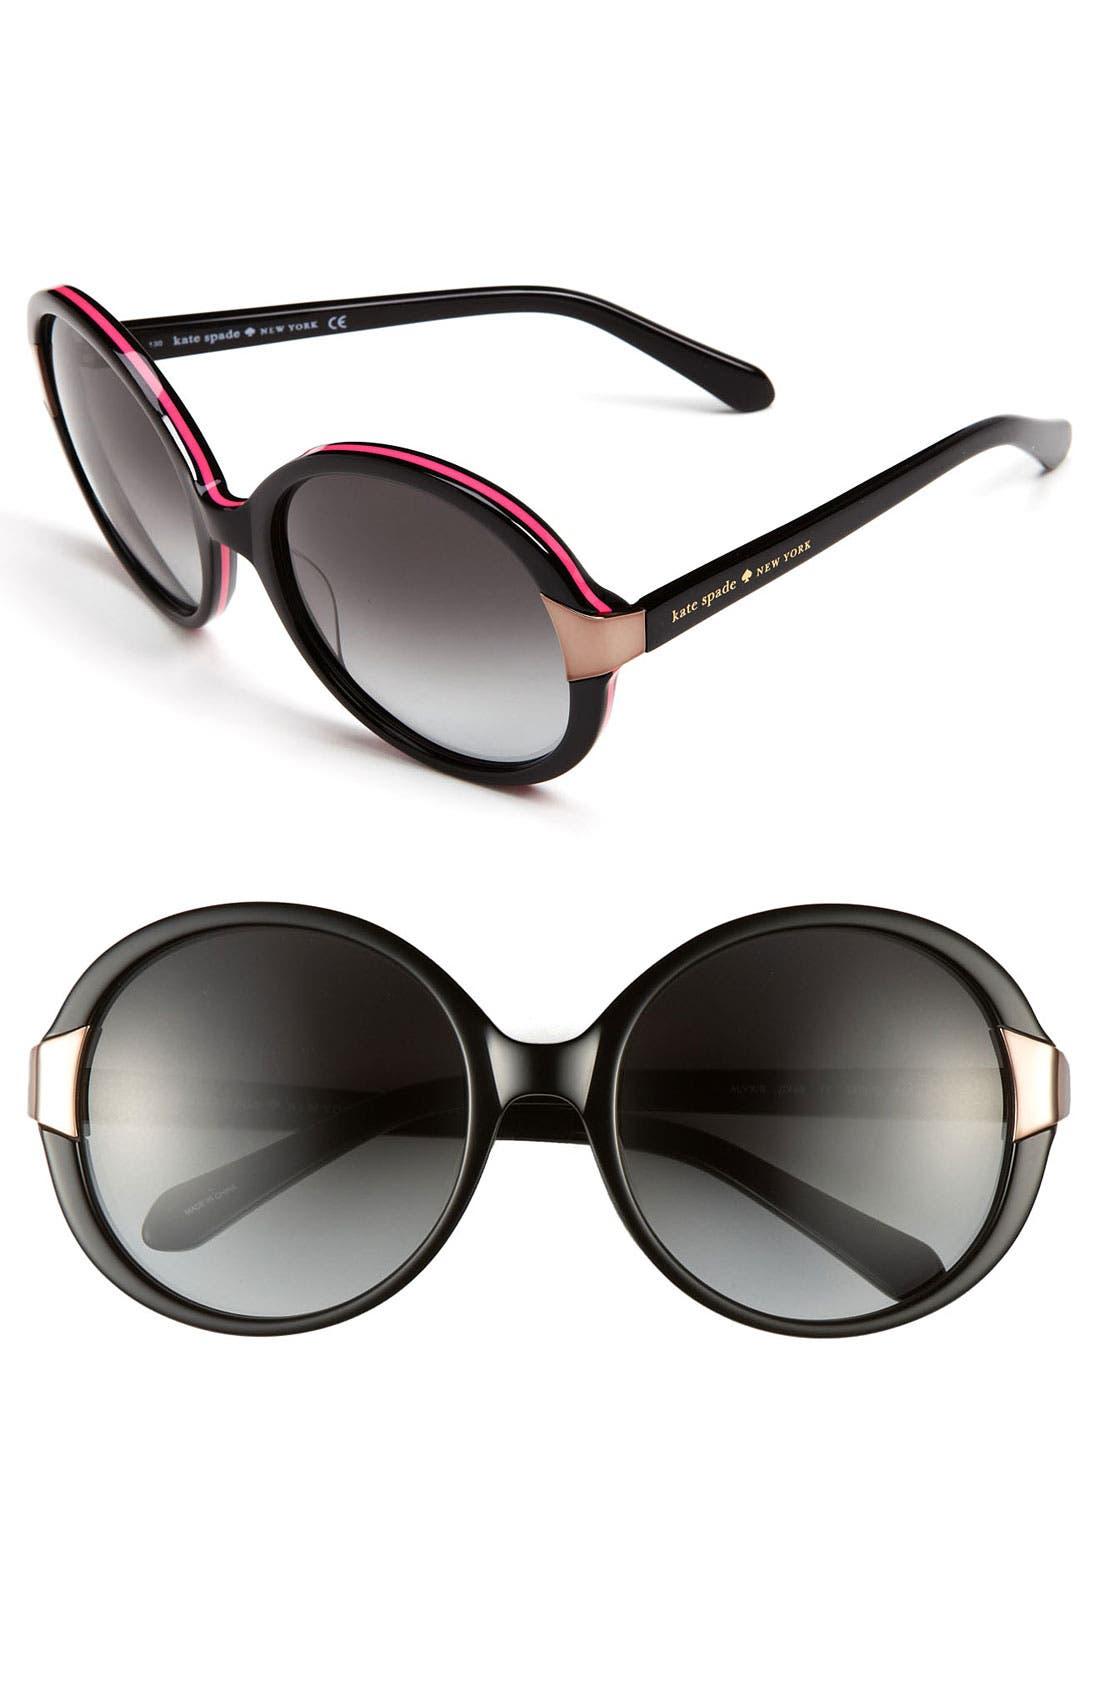 Alternate Image 1 Selected - kate spade new york 'alyx' 56mm oversized sunglasses